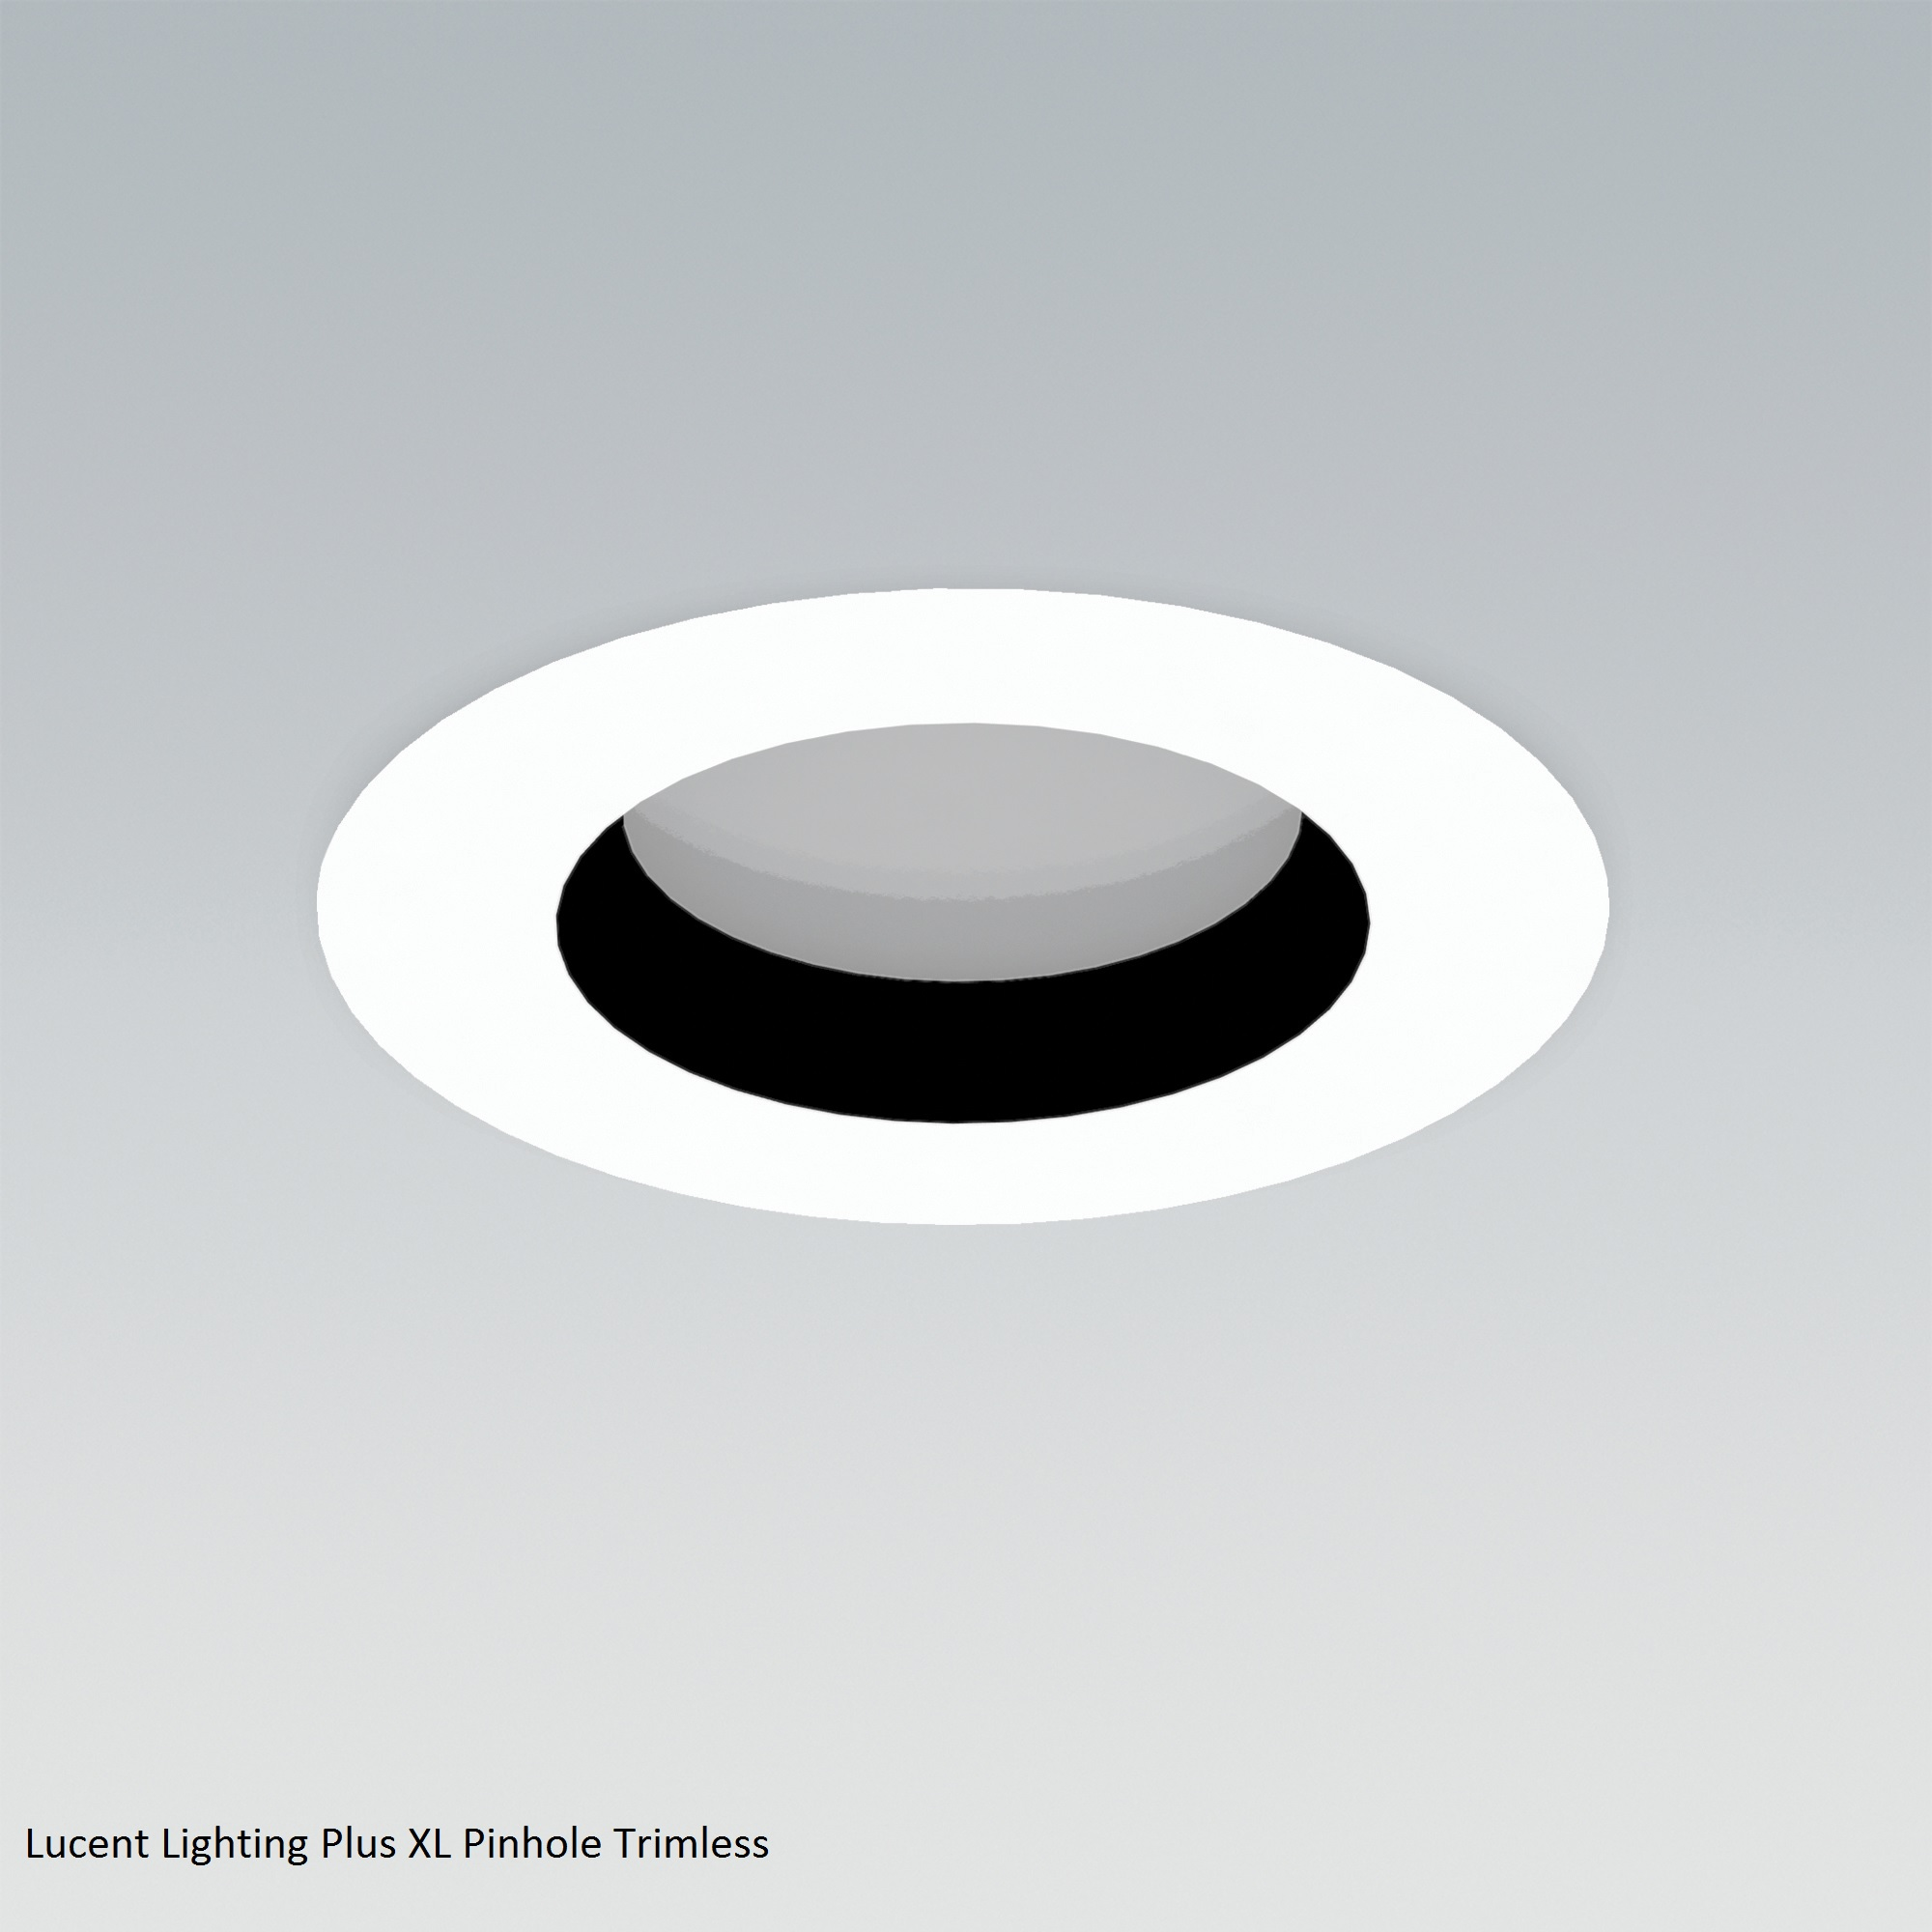 lucent-lighting-plus-xl-pinhole-trimless